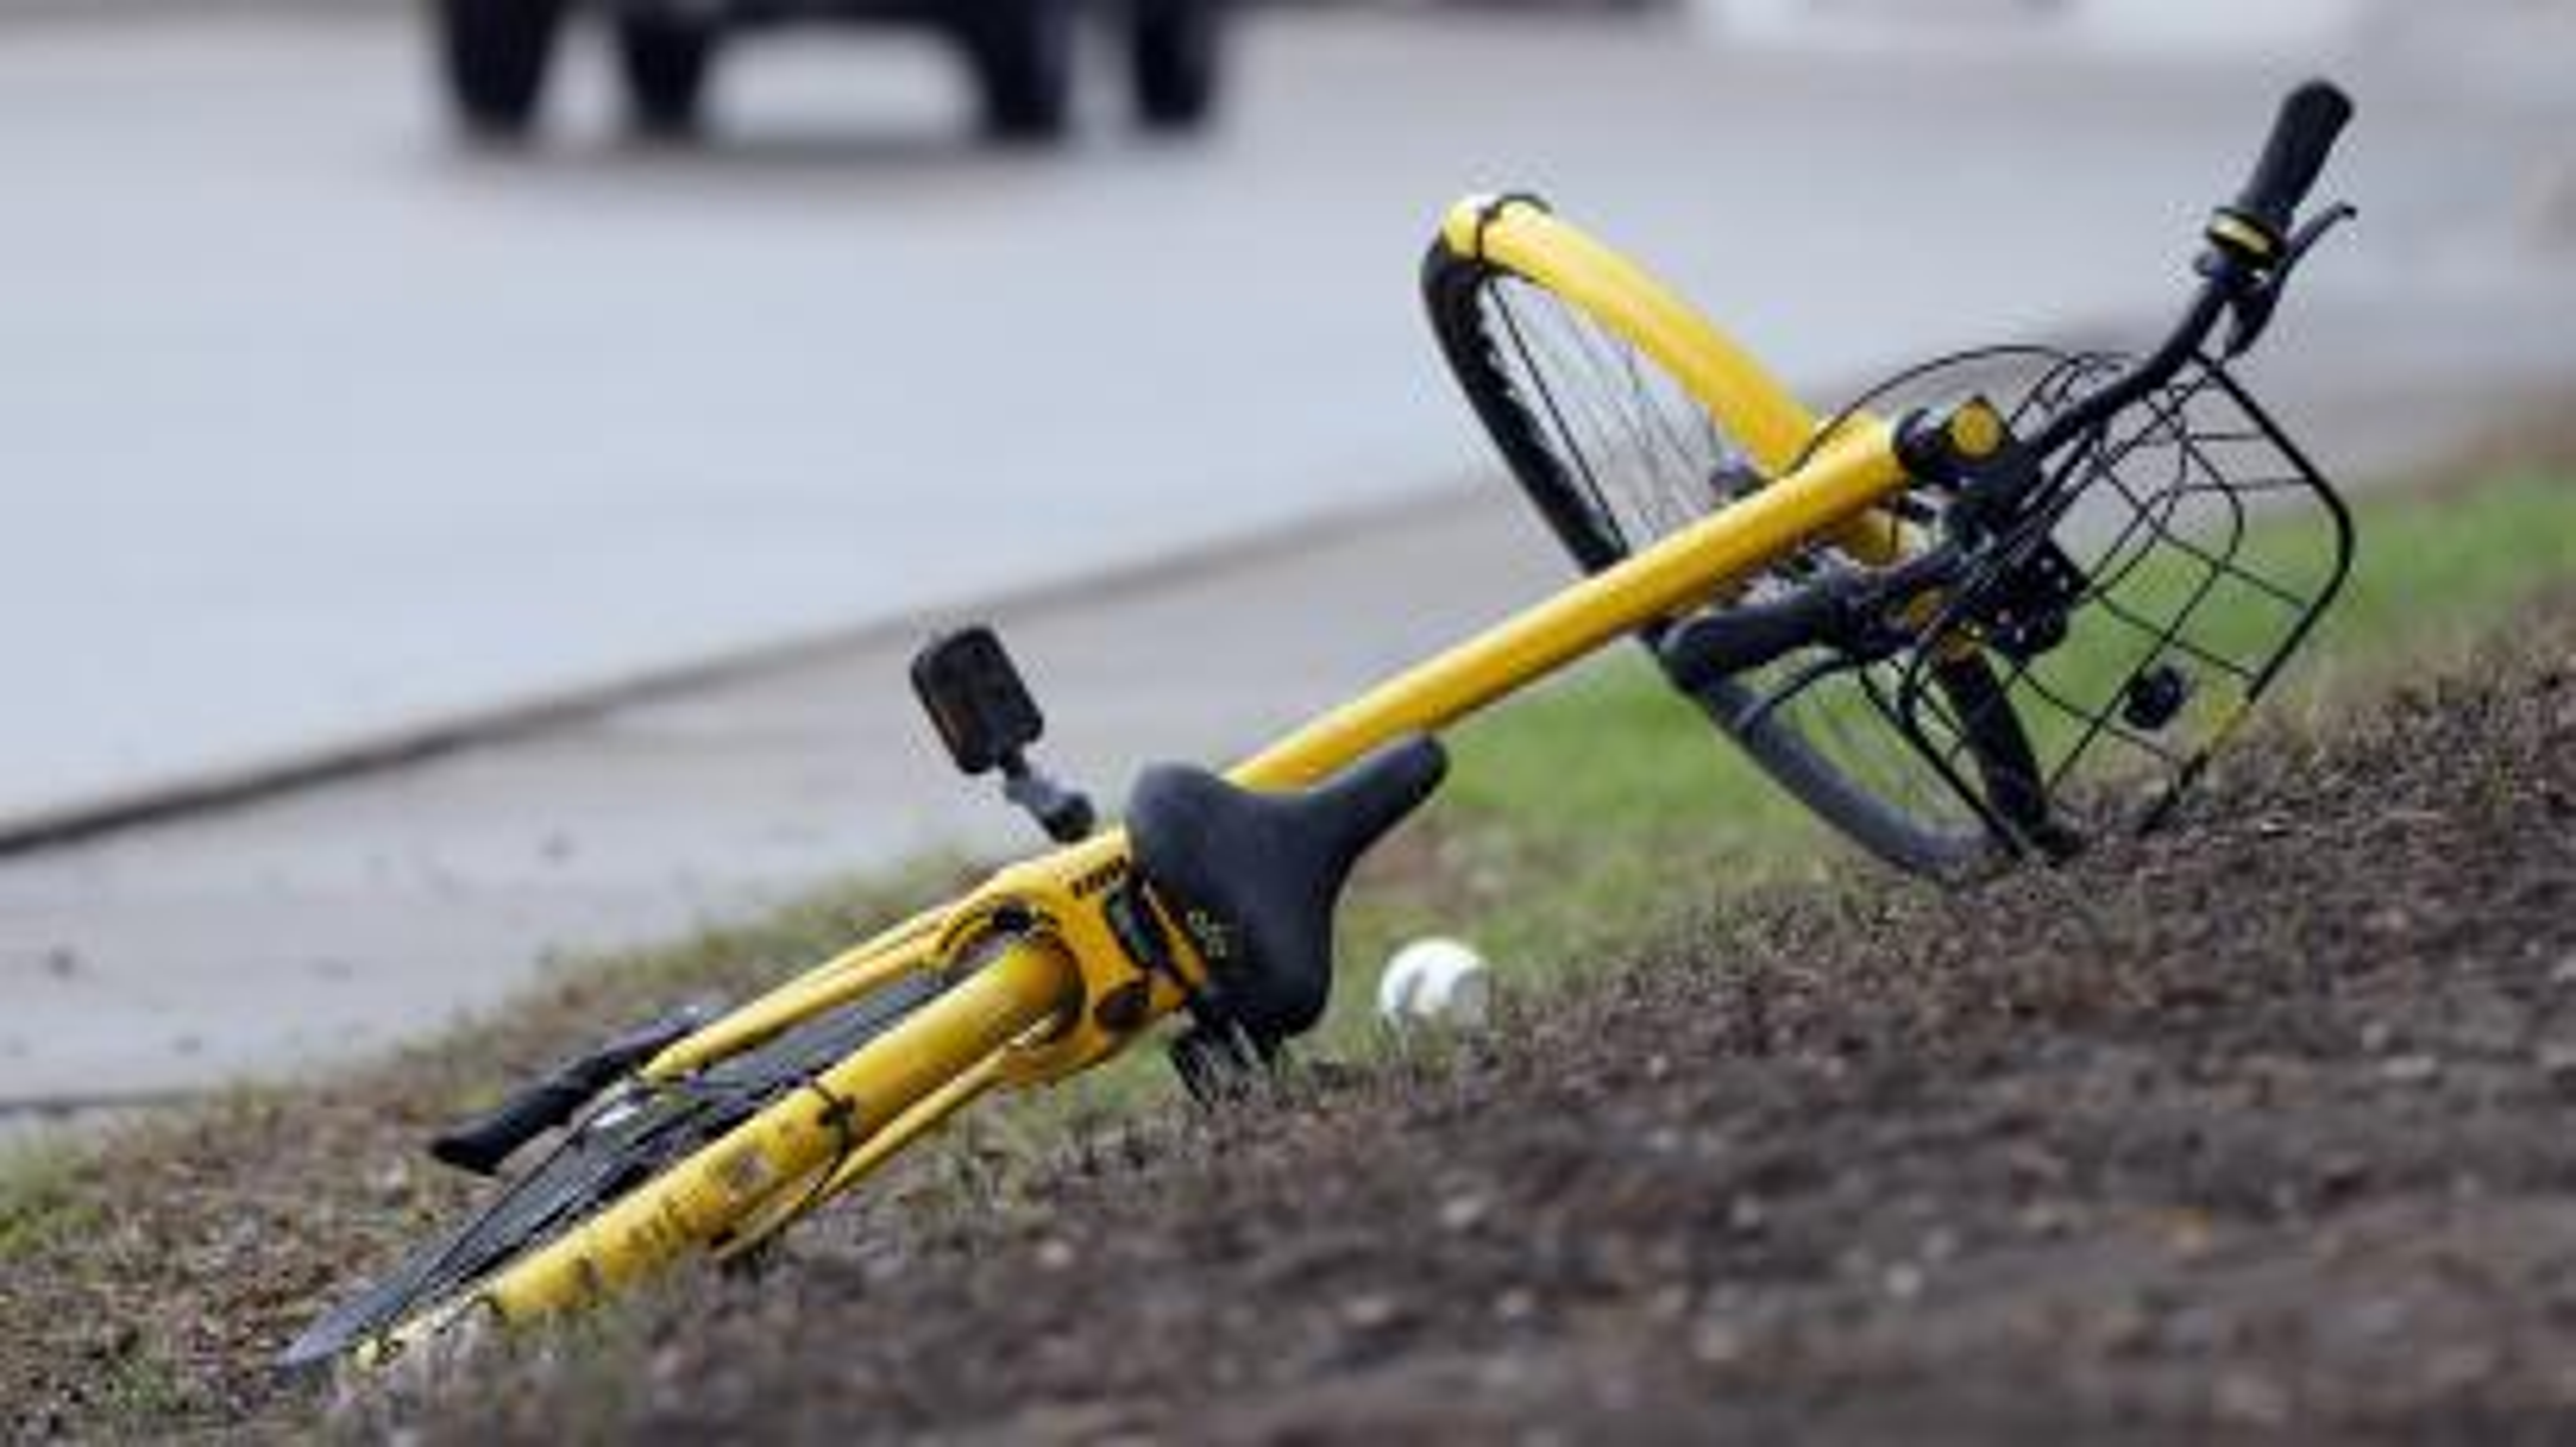 A bike on the ground.